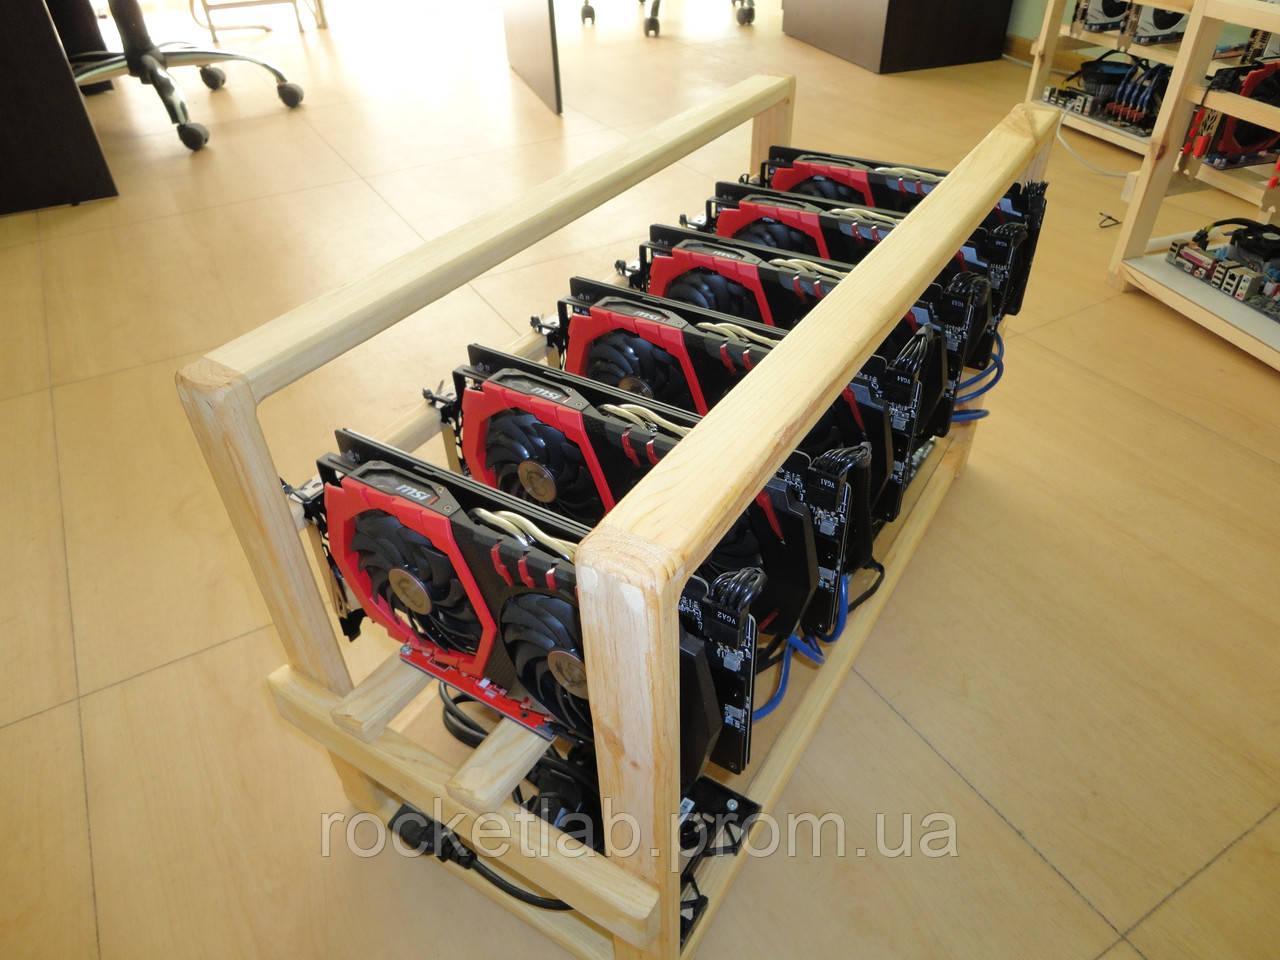 Сборка и настройка майнинг-фермы под ключ (GPU фермы) - RocketLab Лаборатория майнинга в Харькове